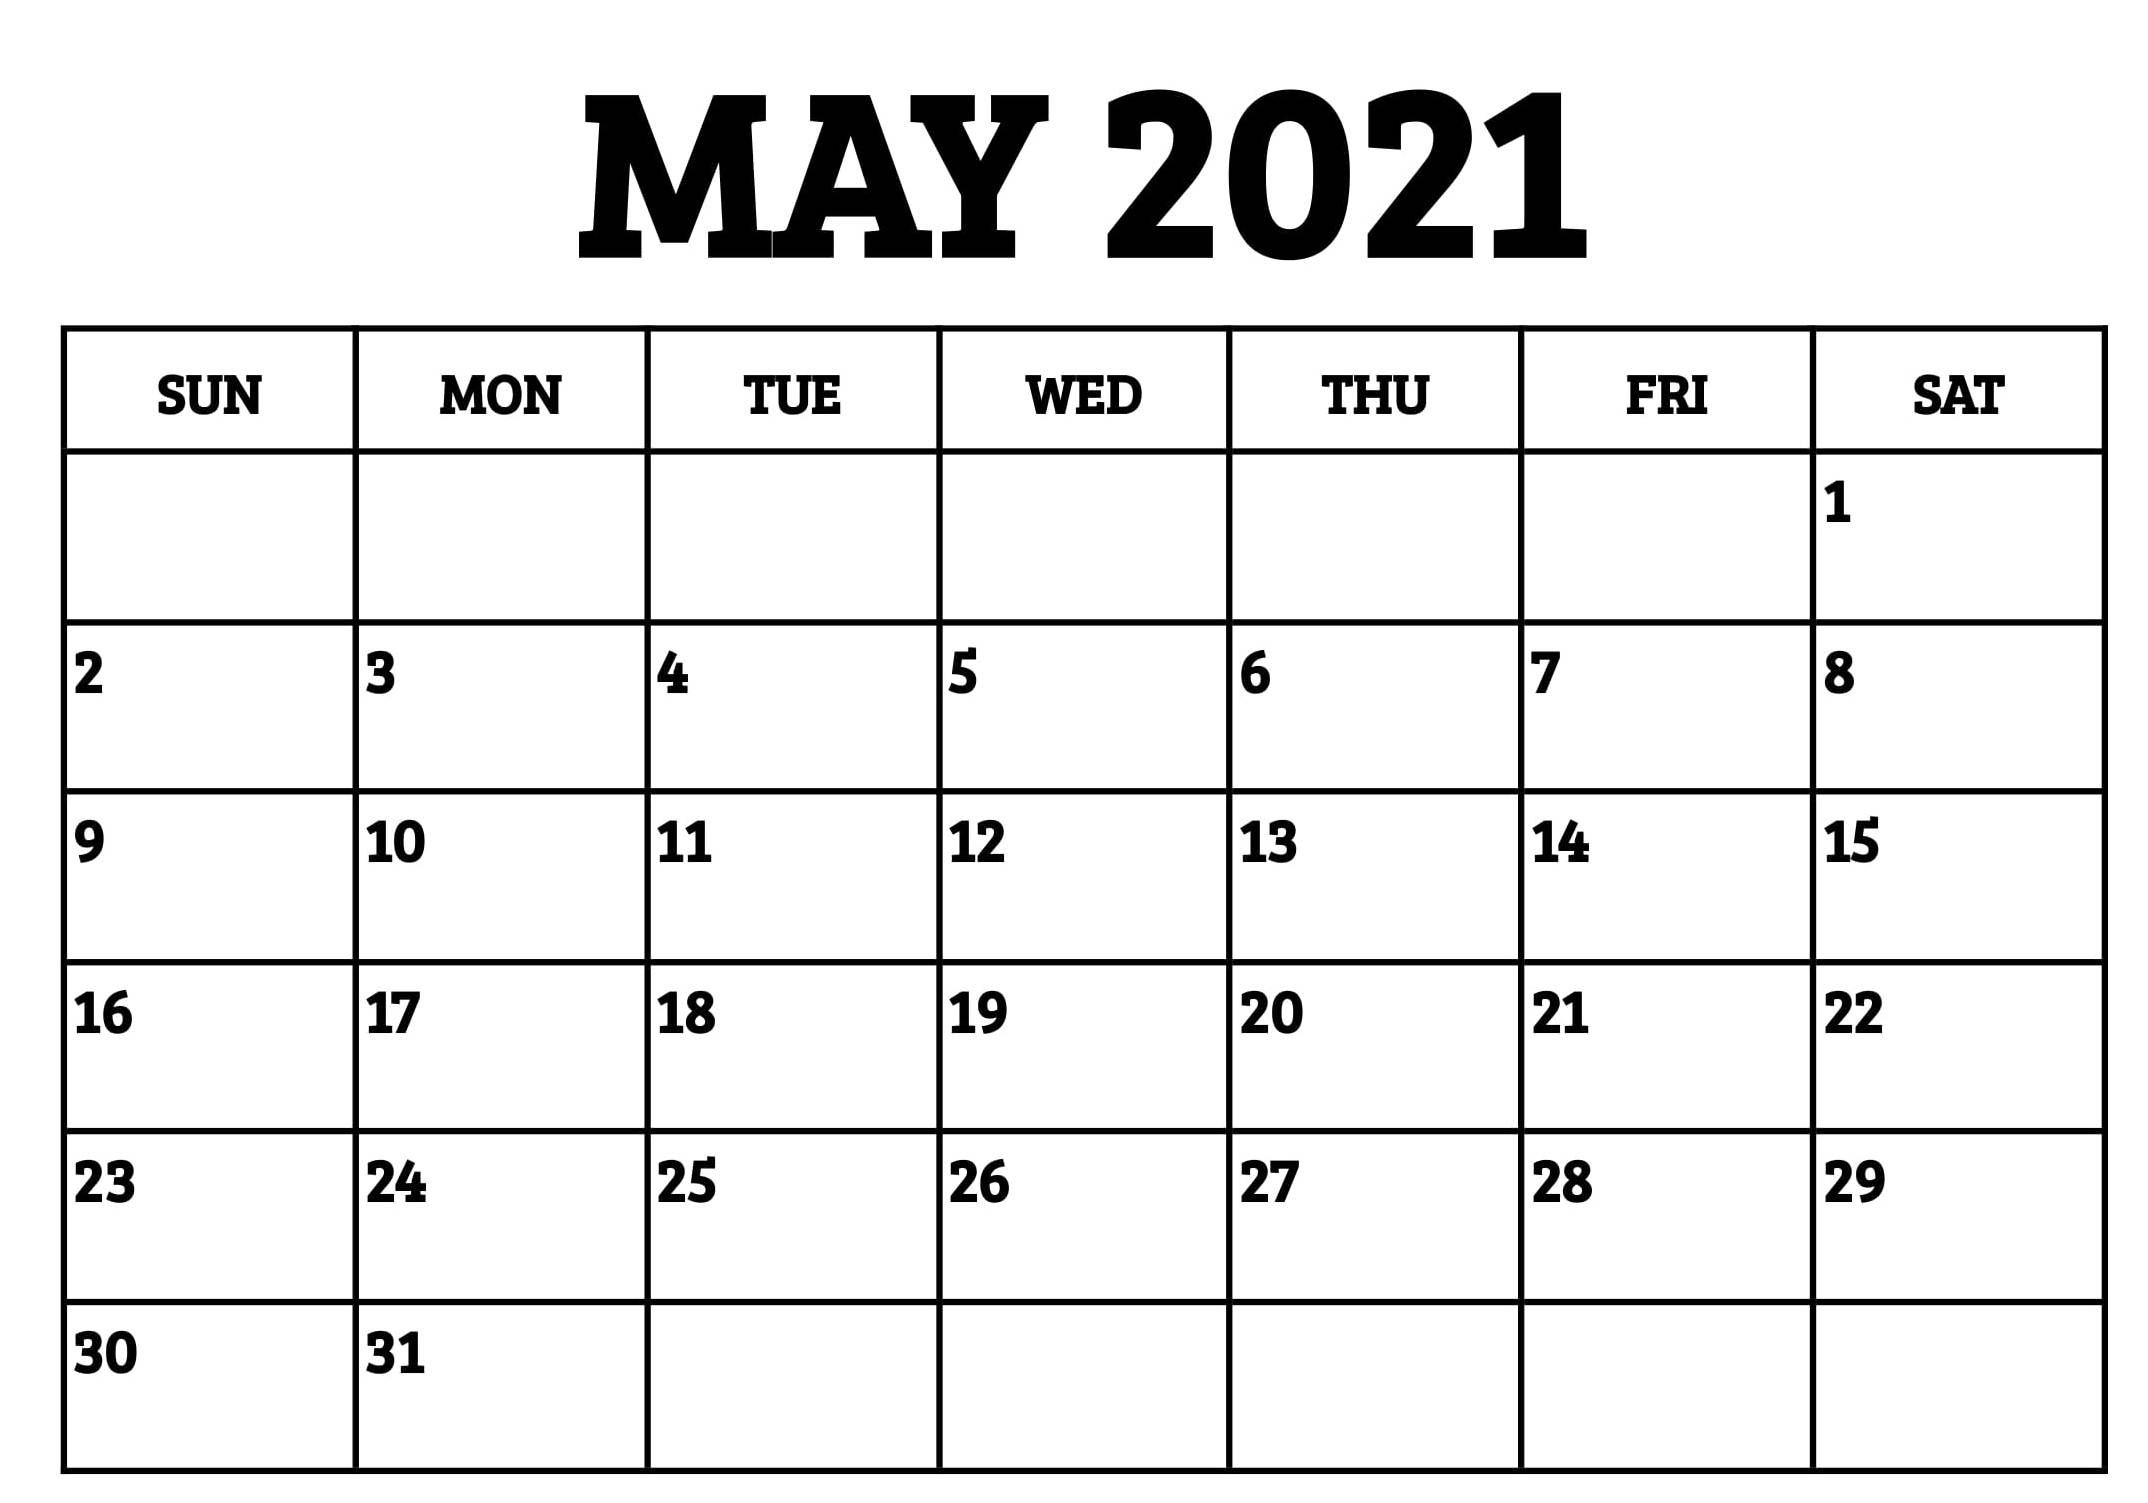 May 2021 Calendar Australia Excel Holidays Month - My Blog